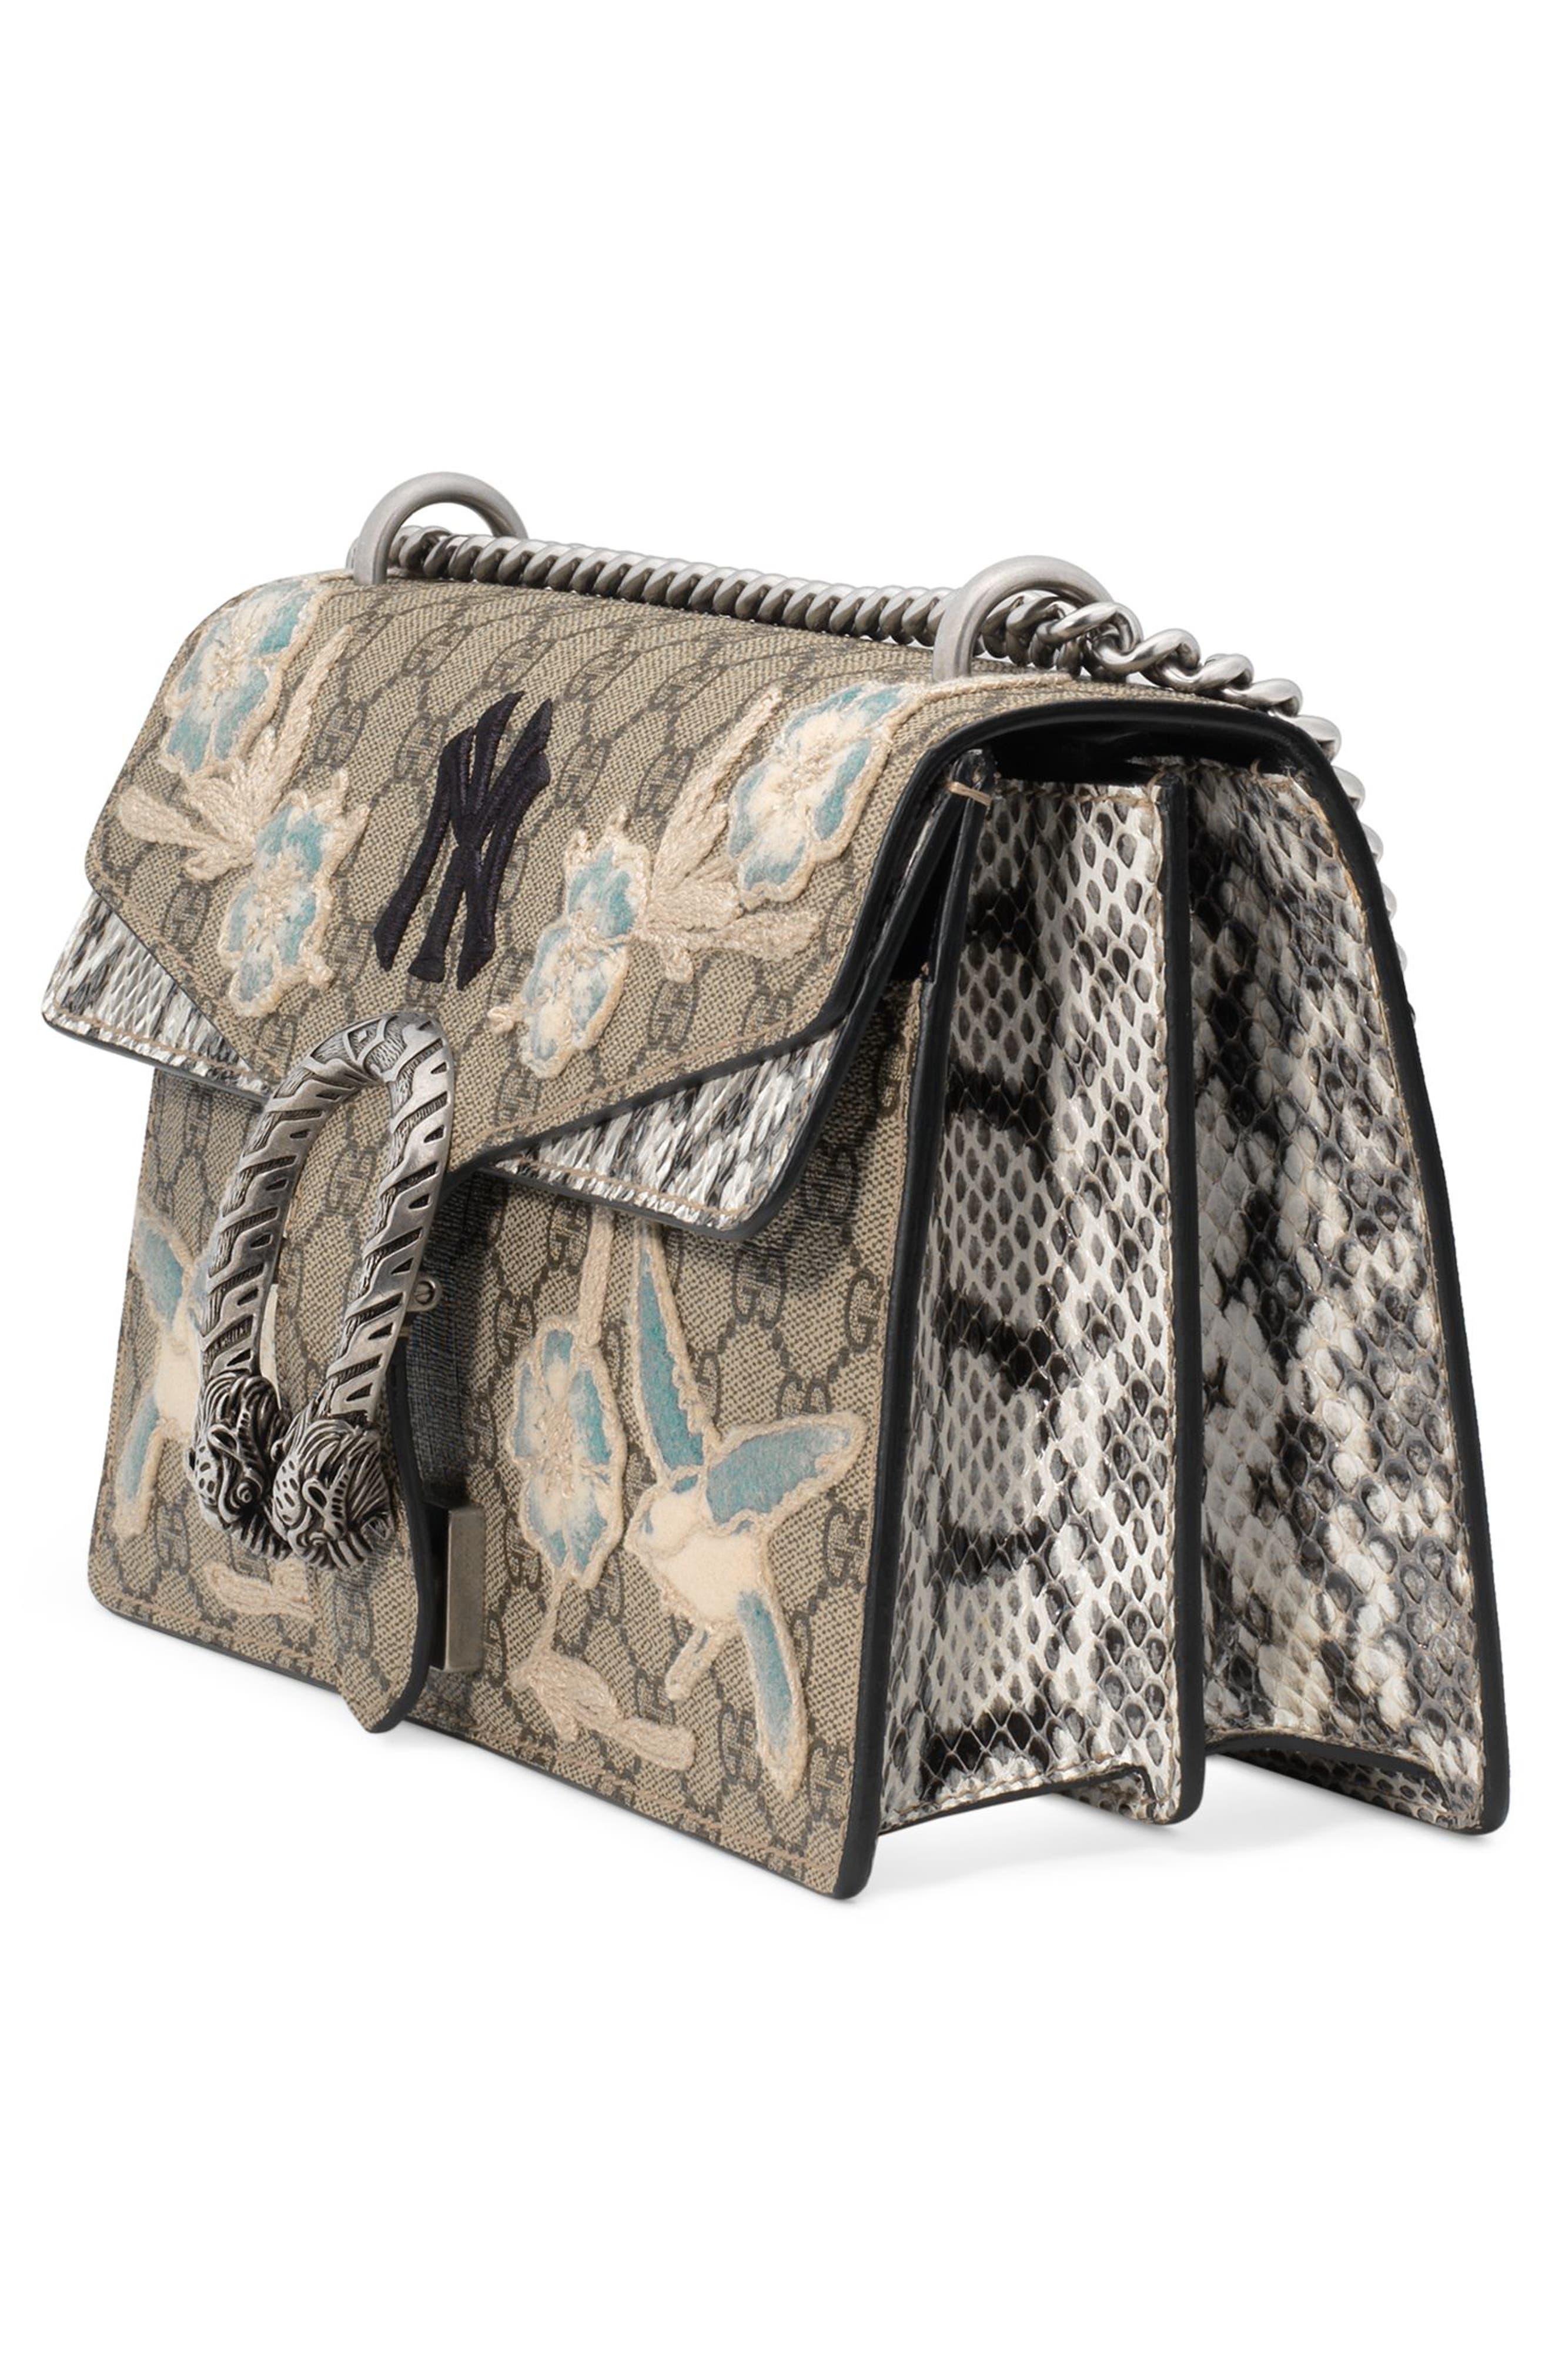 Medium Dionysus GG Supreme & Genuine Snakeskin Shoulder Bag,                             Alternate thumbnail 4, color,                             BEIGE EBONY/ ROCCIA MULTI